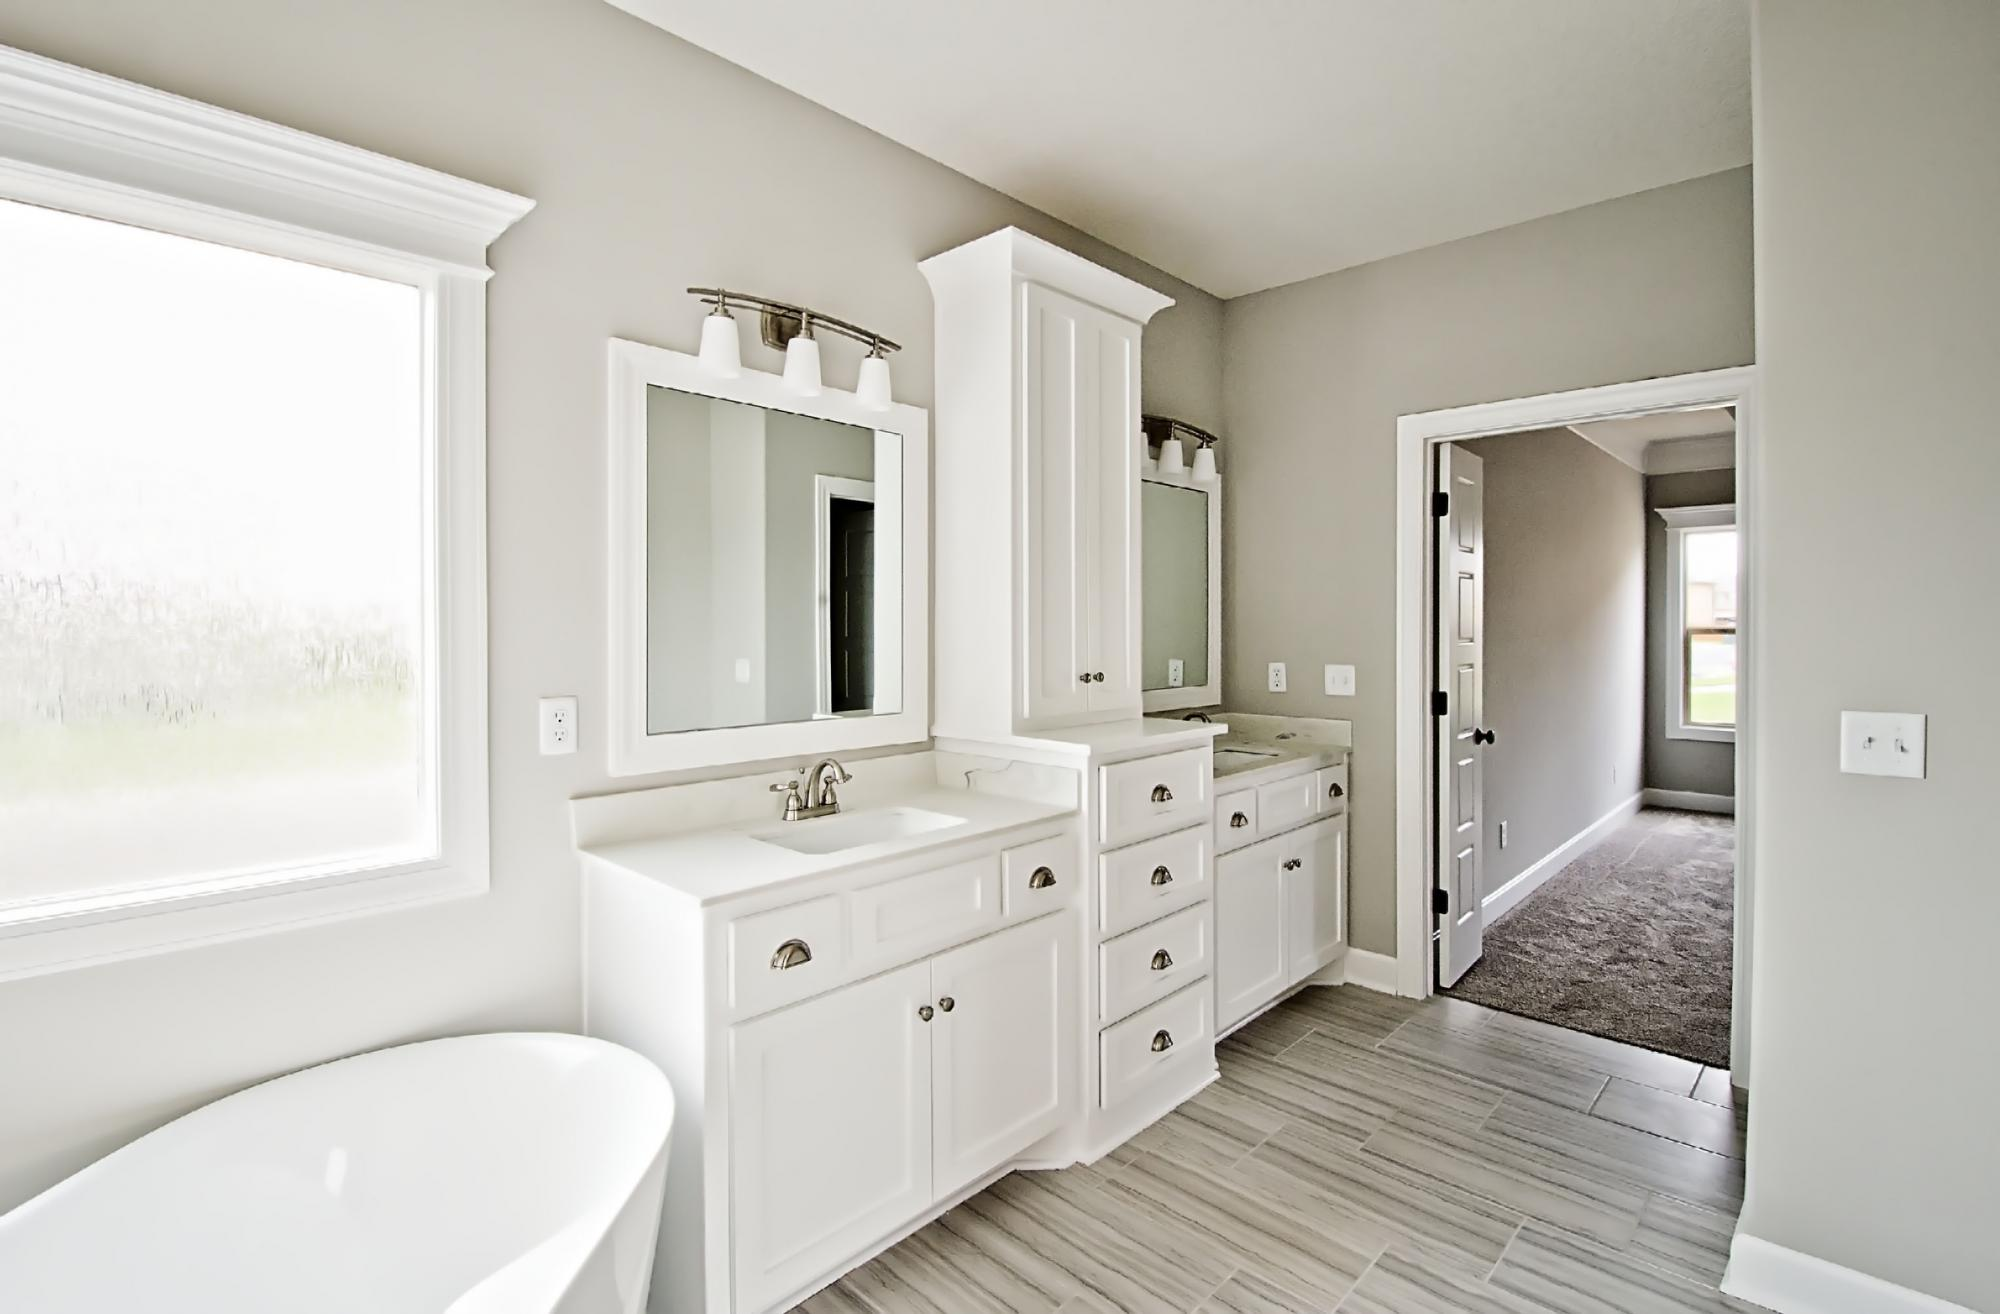 Bathrooms Photo Gallery | Custom Homes in Blue Springs MO | Rob ...